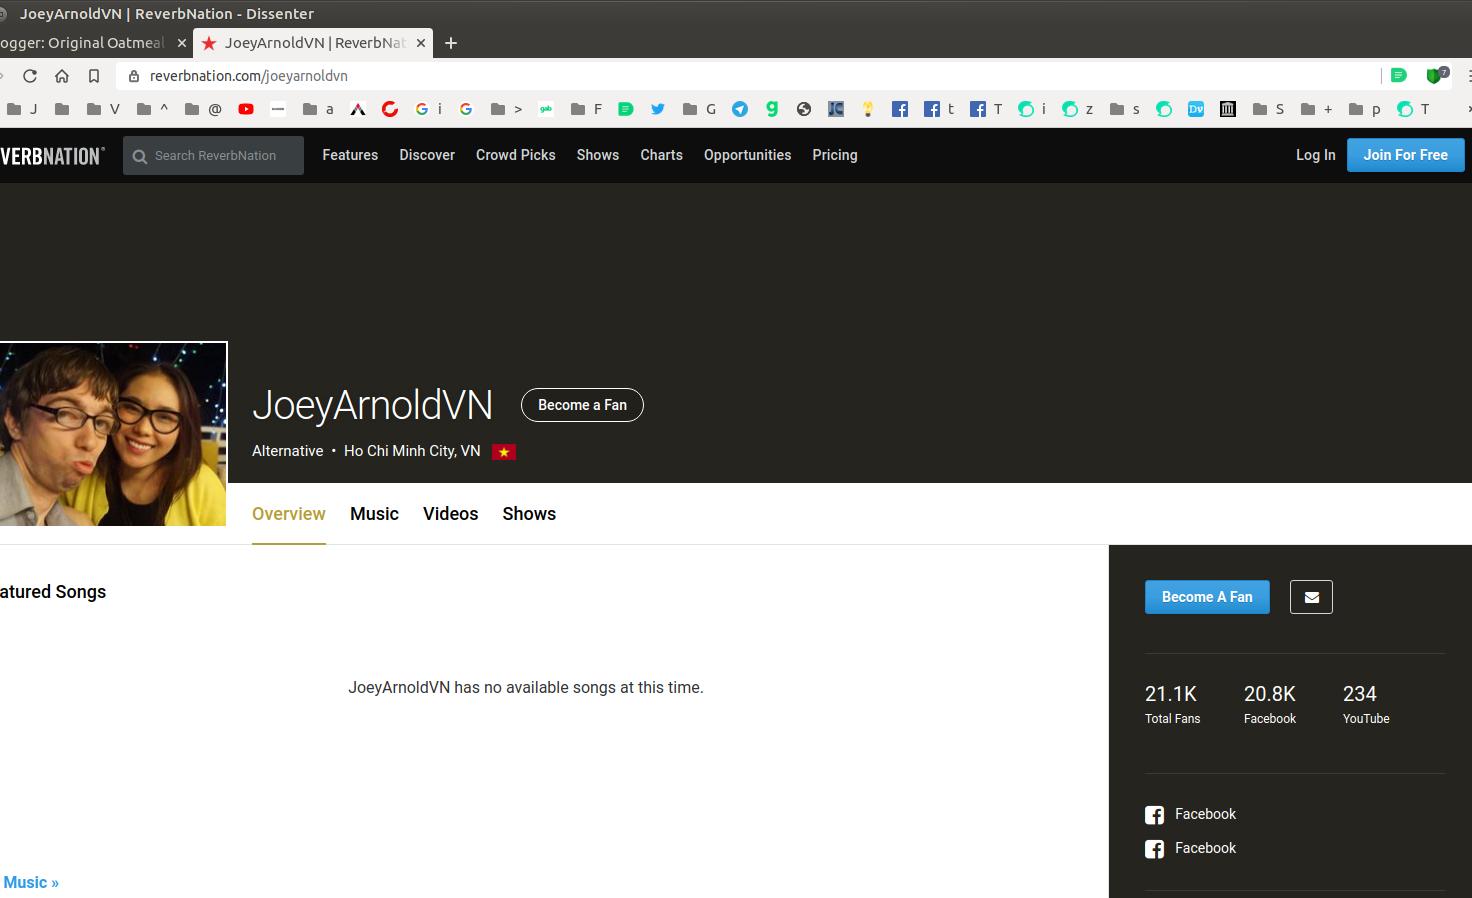 Reverbnation Screenshot at 2020-05-30 19:45:09.png